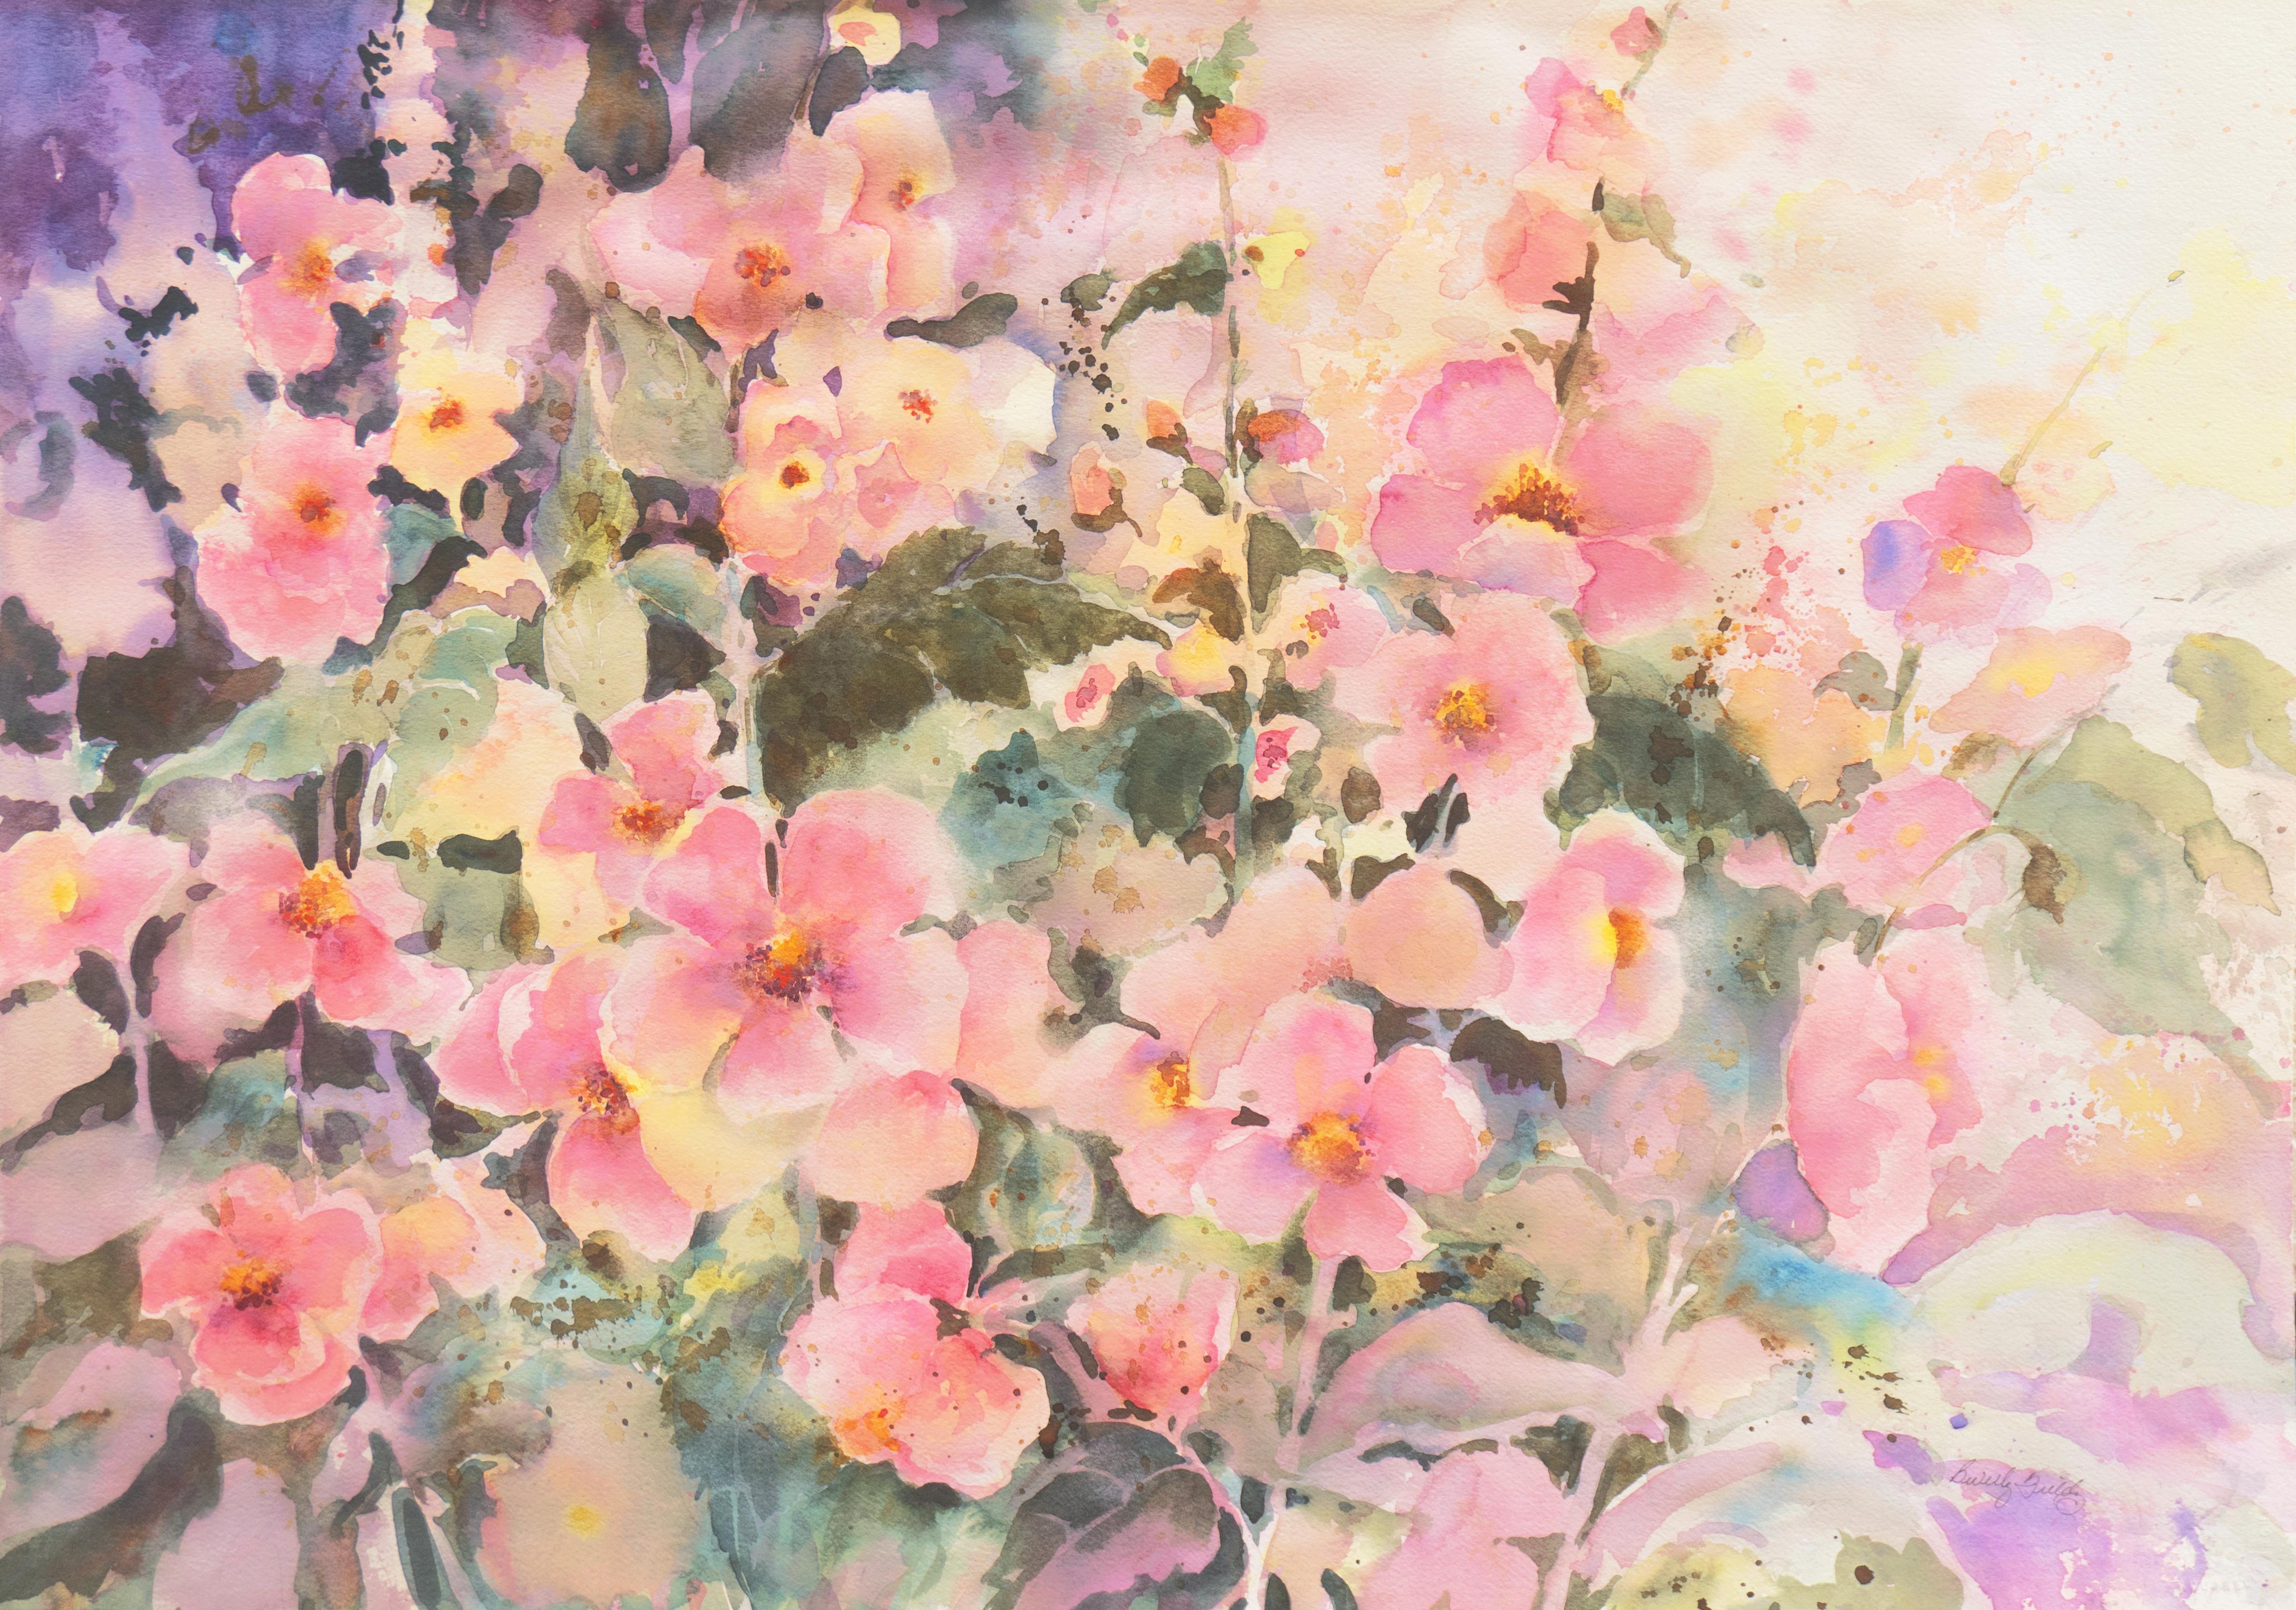 'Pink Daisies', California Watercolor Society, SWA, Woman Artist, Zoltan Szabo